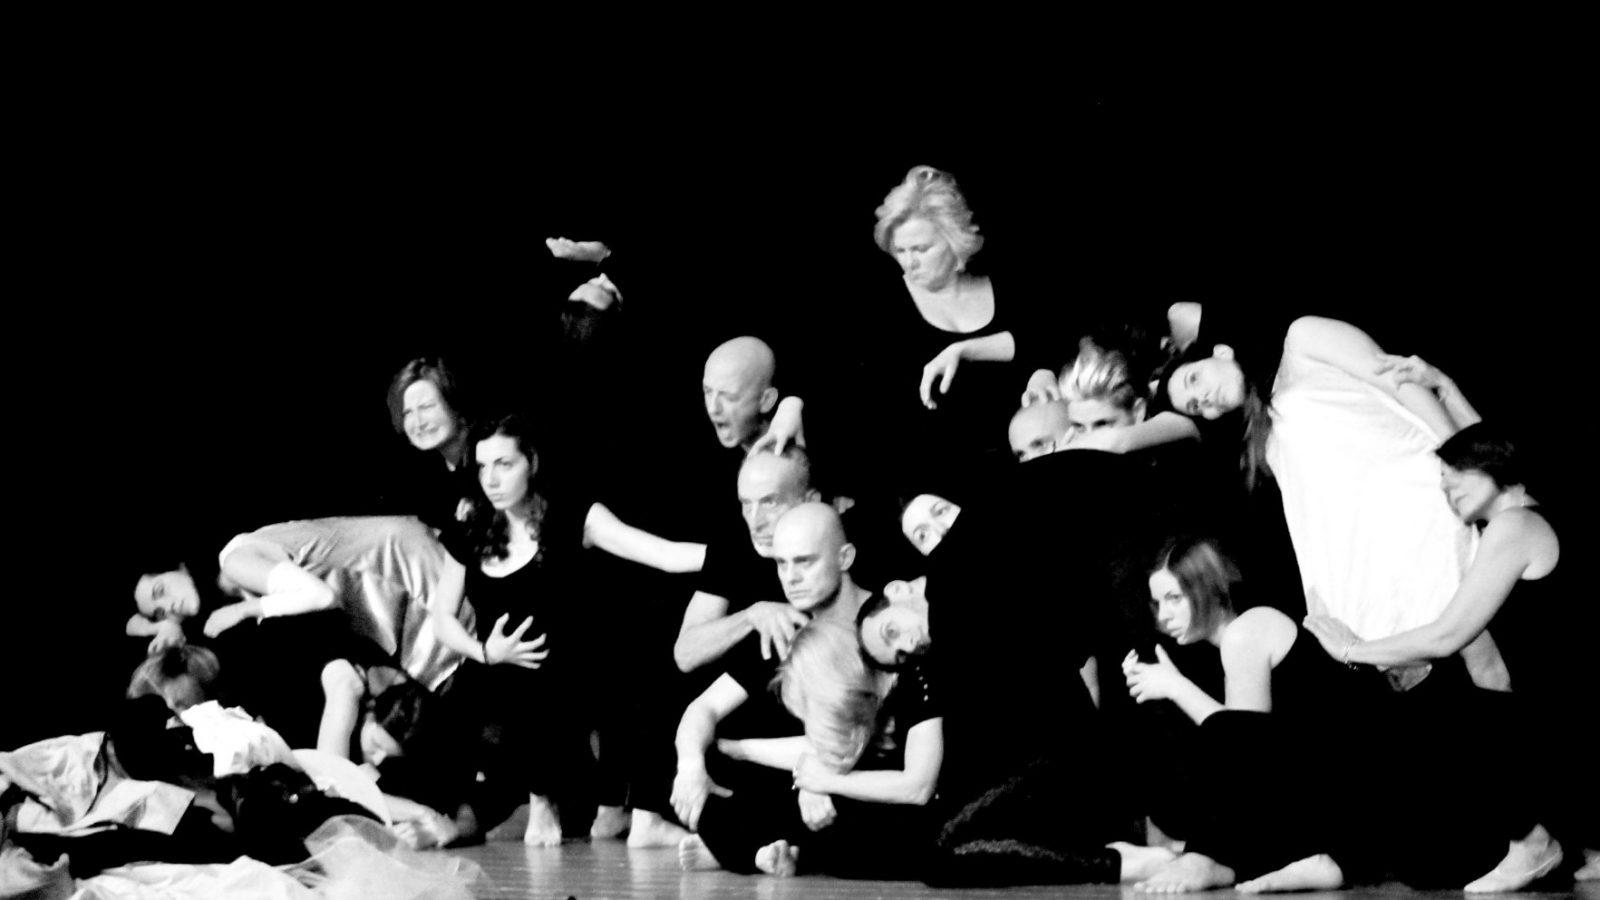 Le Acque compagnia teatrale - master